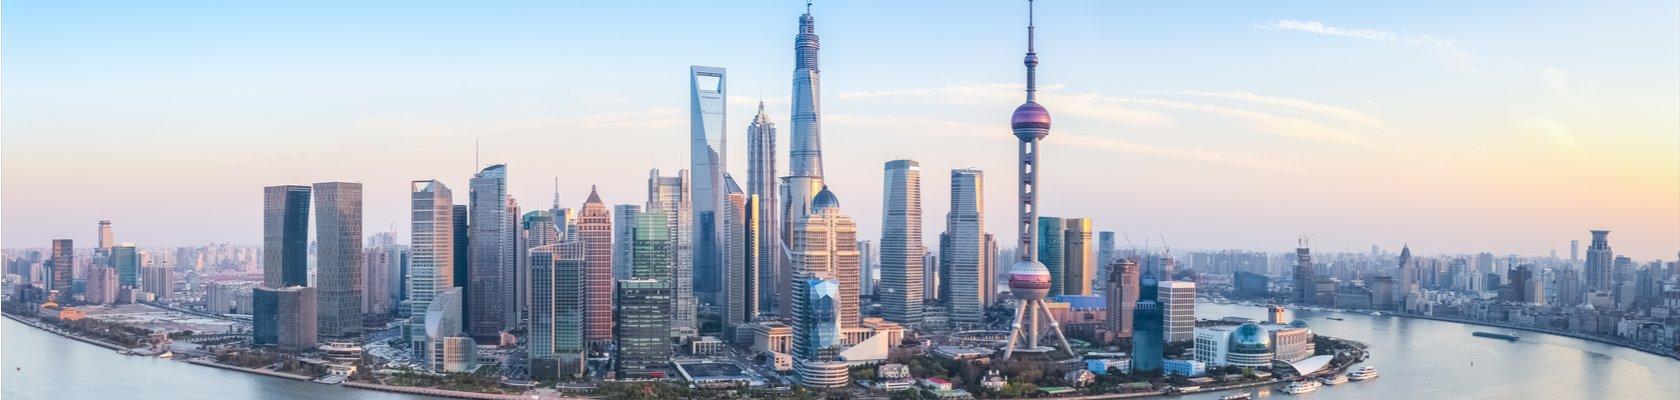 Skyline van Shanghai